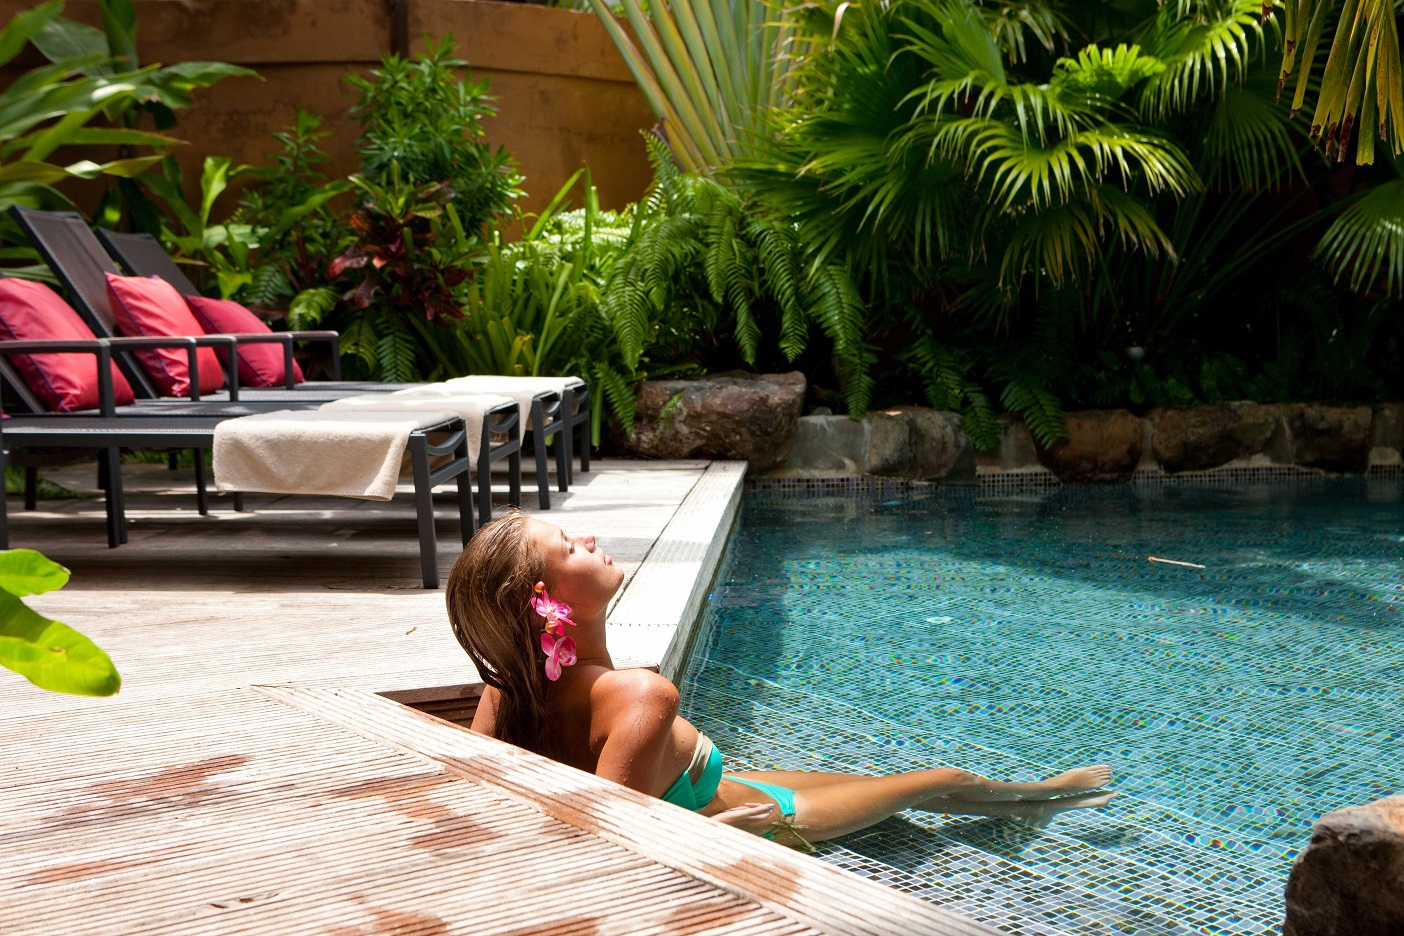 Private Pool Villa Pool Deck and Woman.jpg